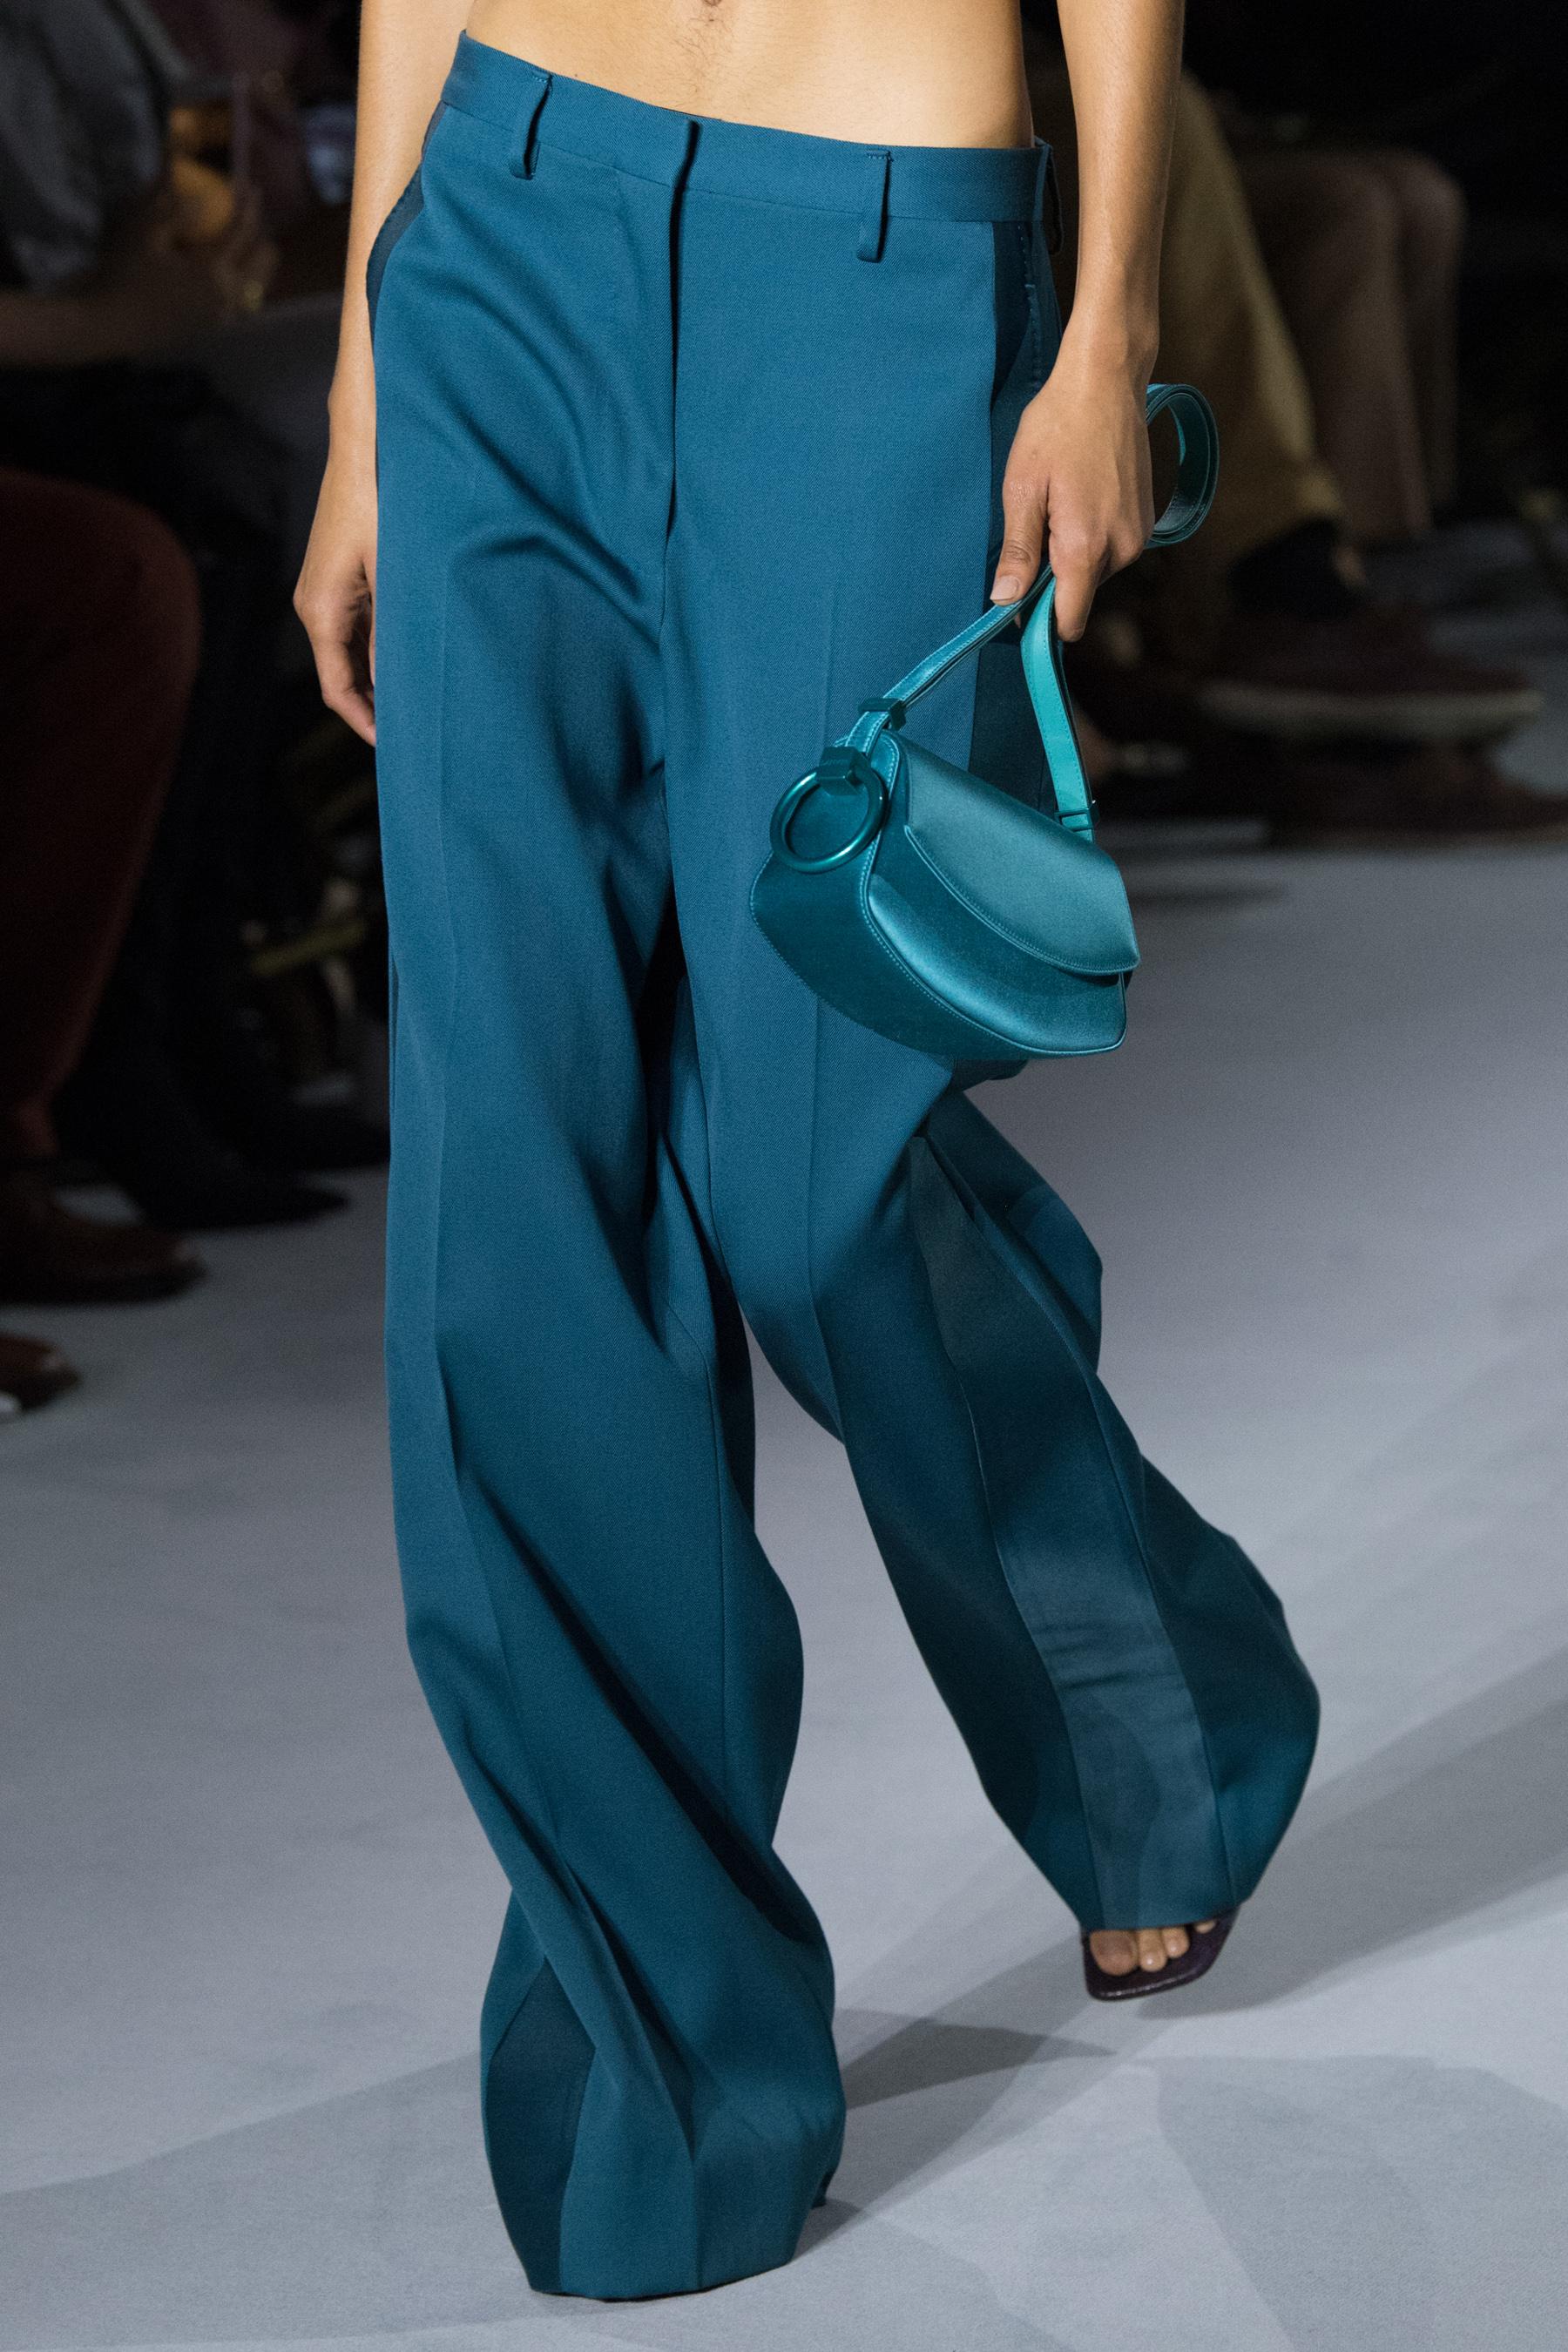 Lanvin Spring 2022 Details Fashion Show